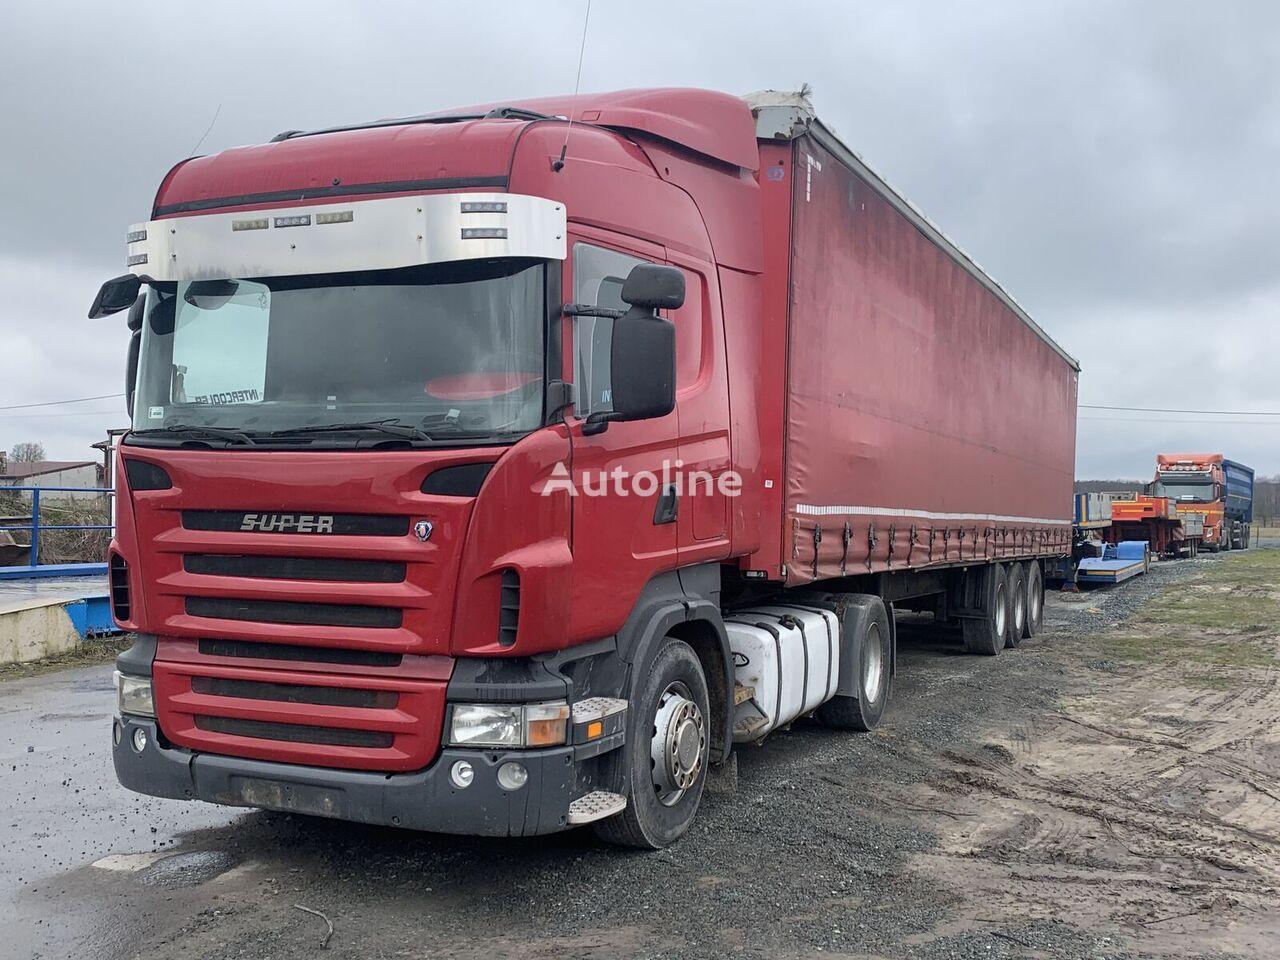 SCANIA SCANIA R420 EURO5 GRSO905  DC1215 tractora